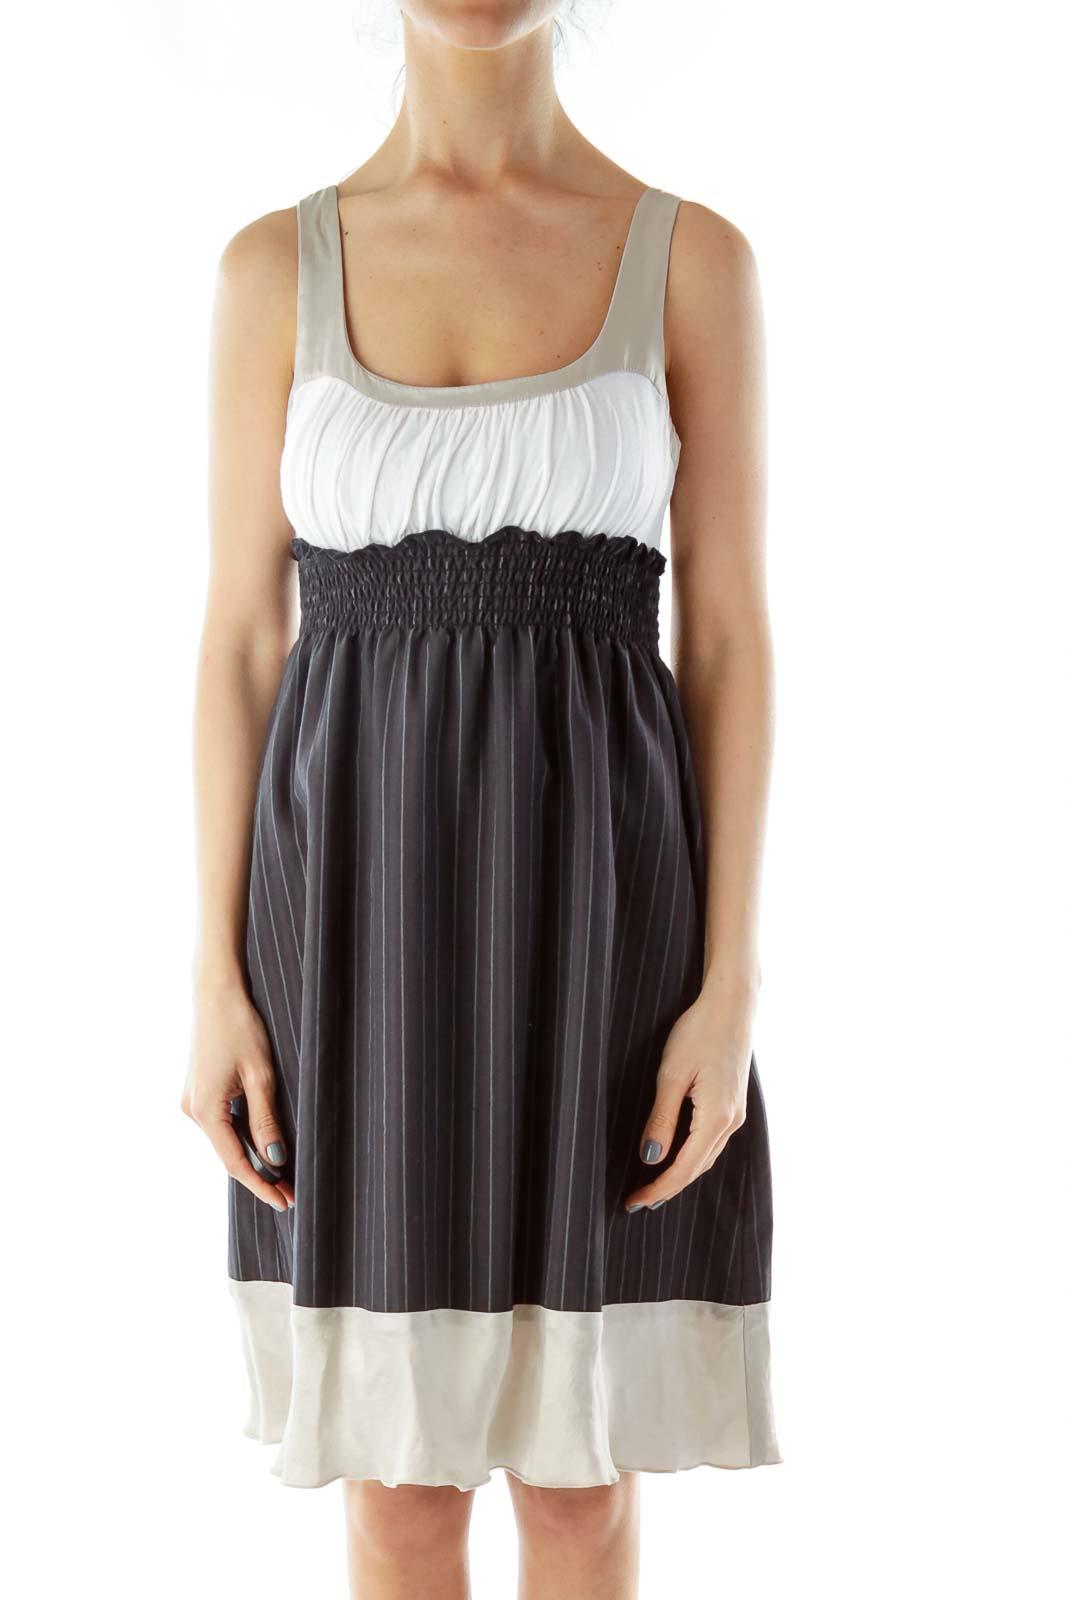 Blue Gray Pinstripe Dress Front